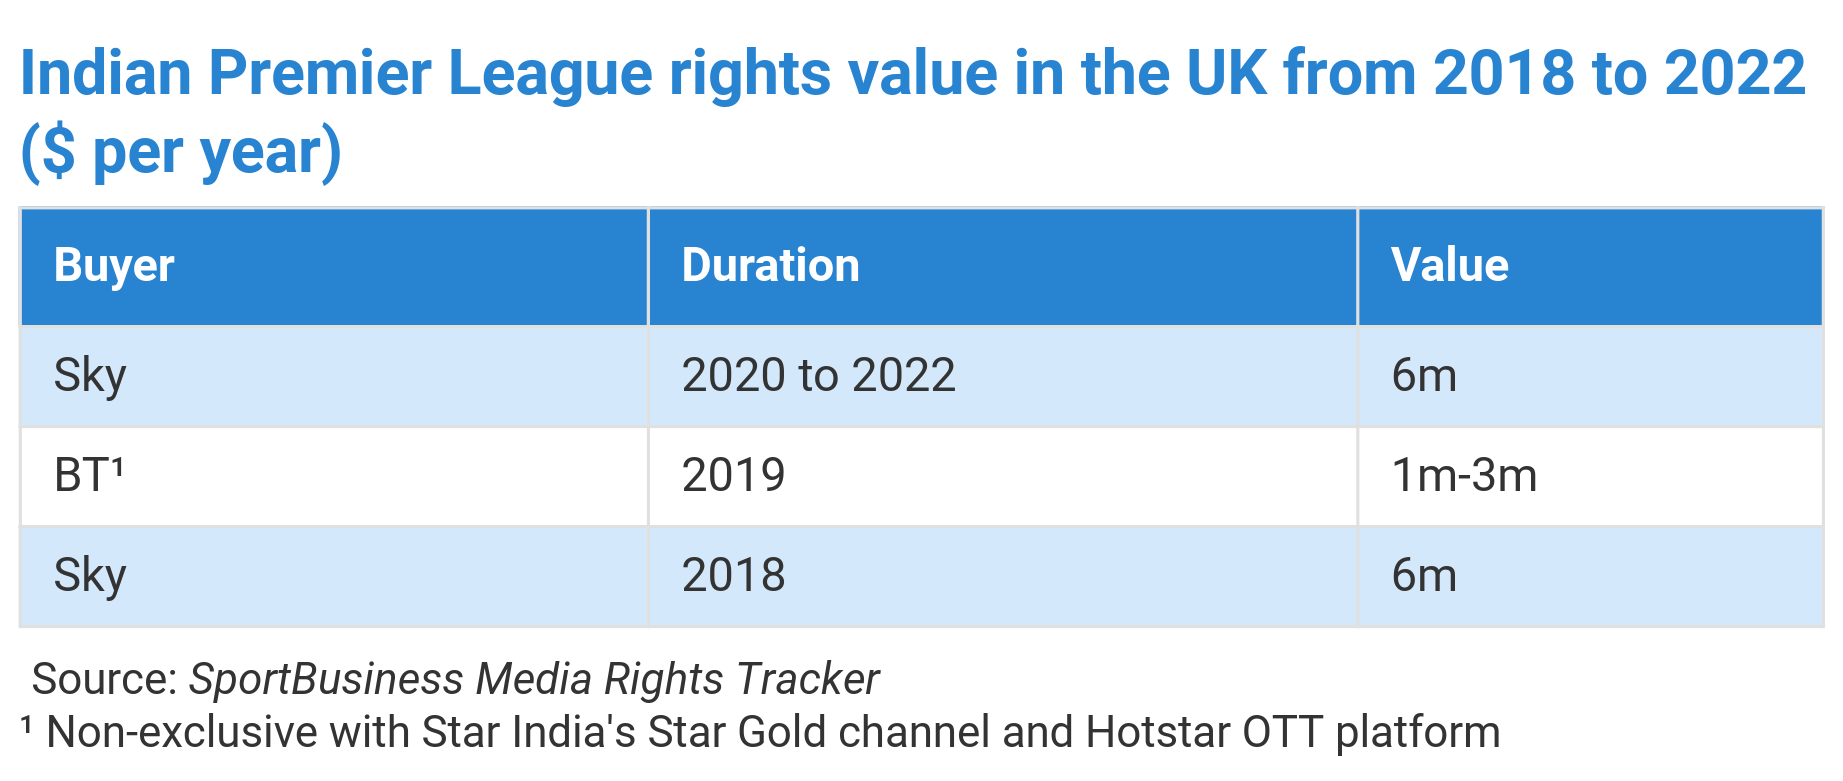 Disney S Pivot To India Focused Hotstar Strategy Opened Door To Sky Ipl Reunion In The Uk Sportbusiness Media